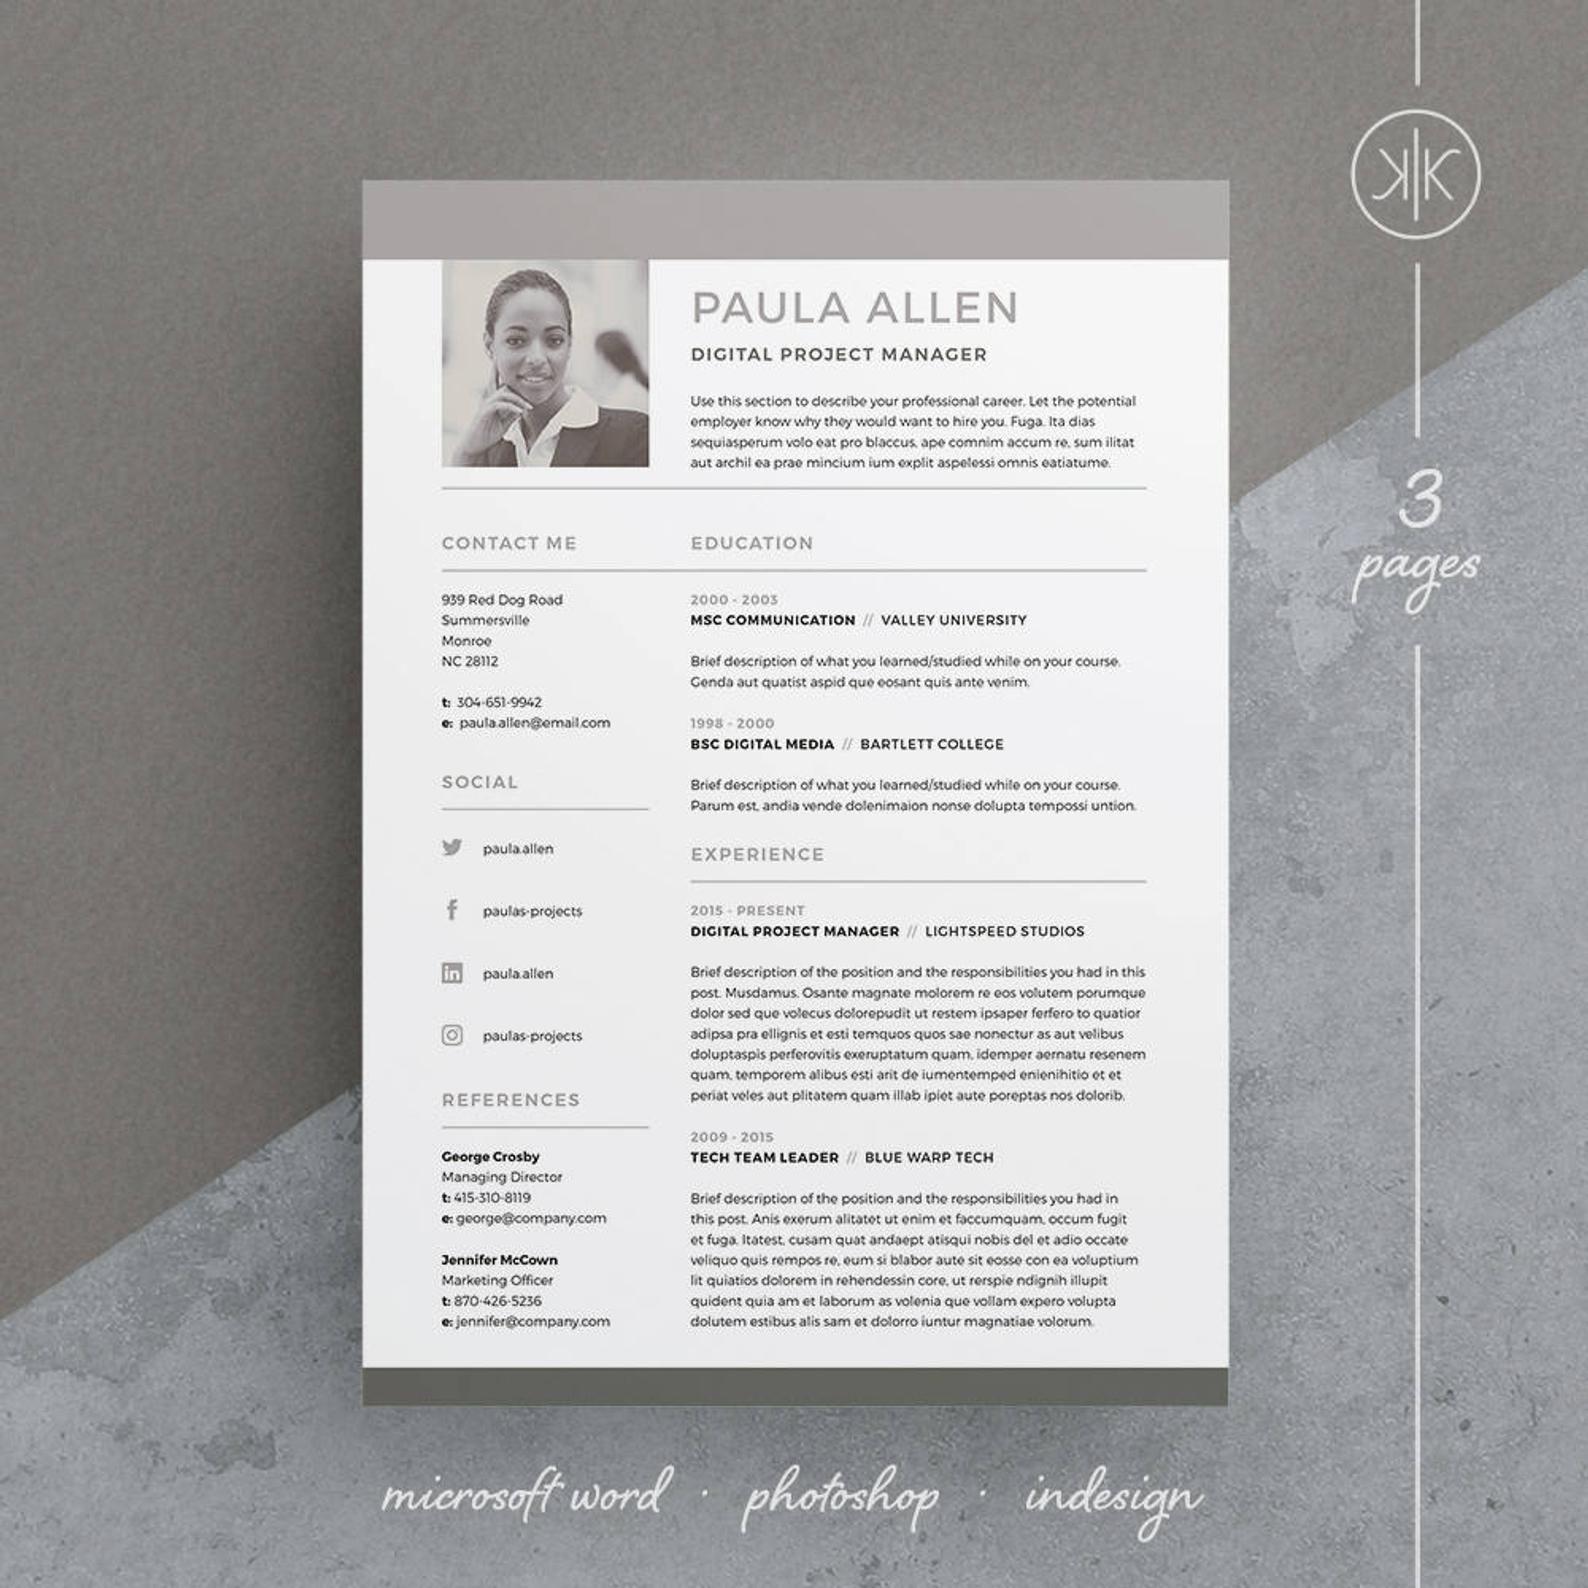 Paula Resume/CV Template Word InDesign Etsy in